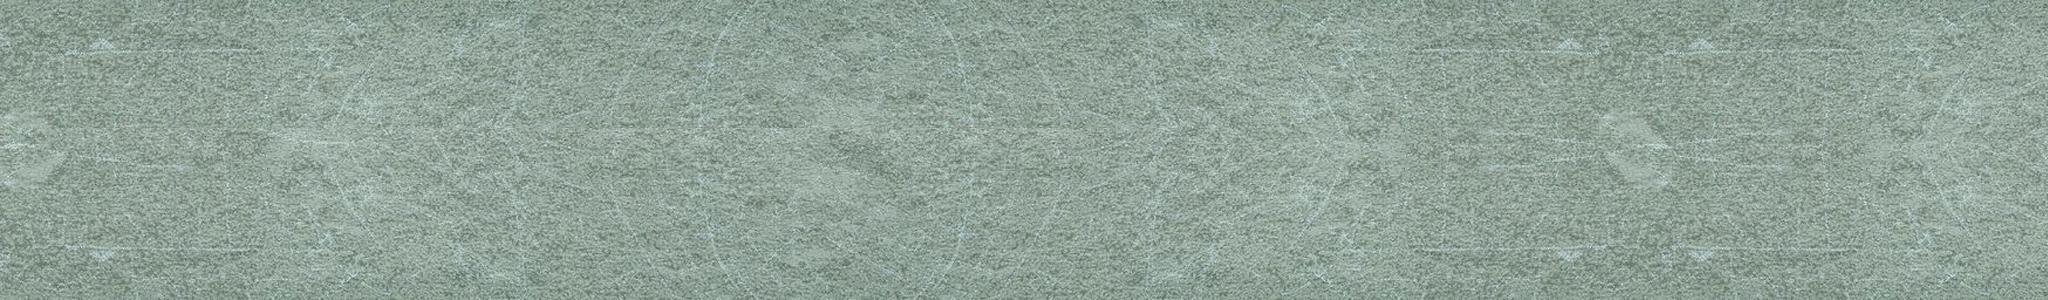 HD 29714 ABS hrana beton perla